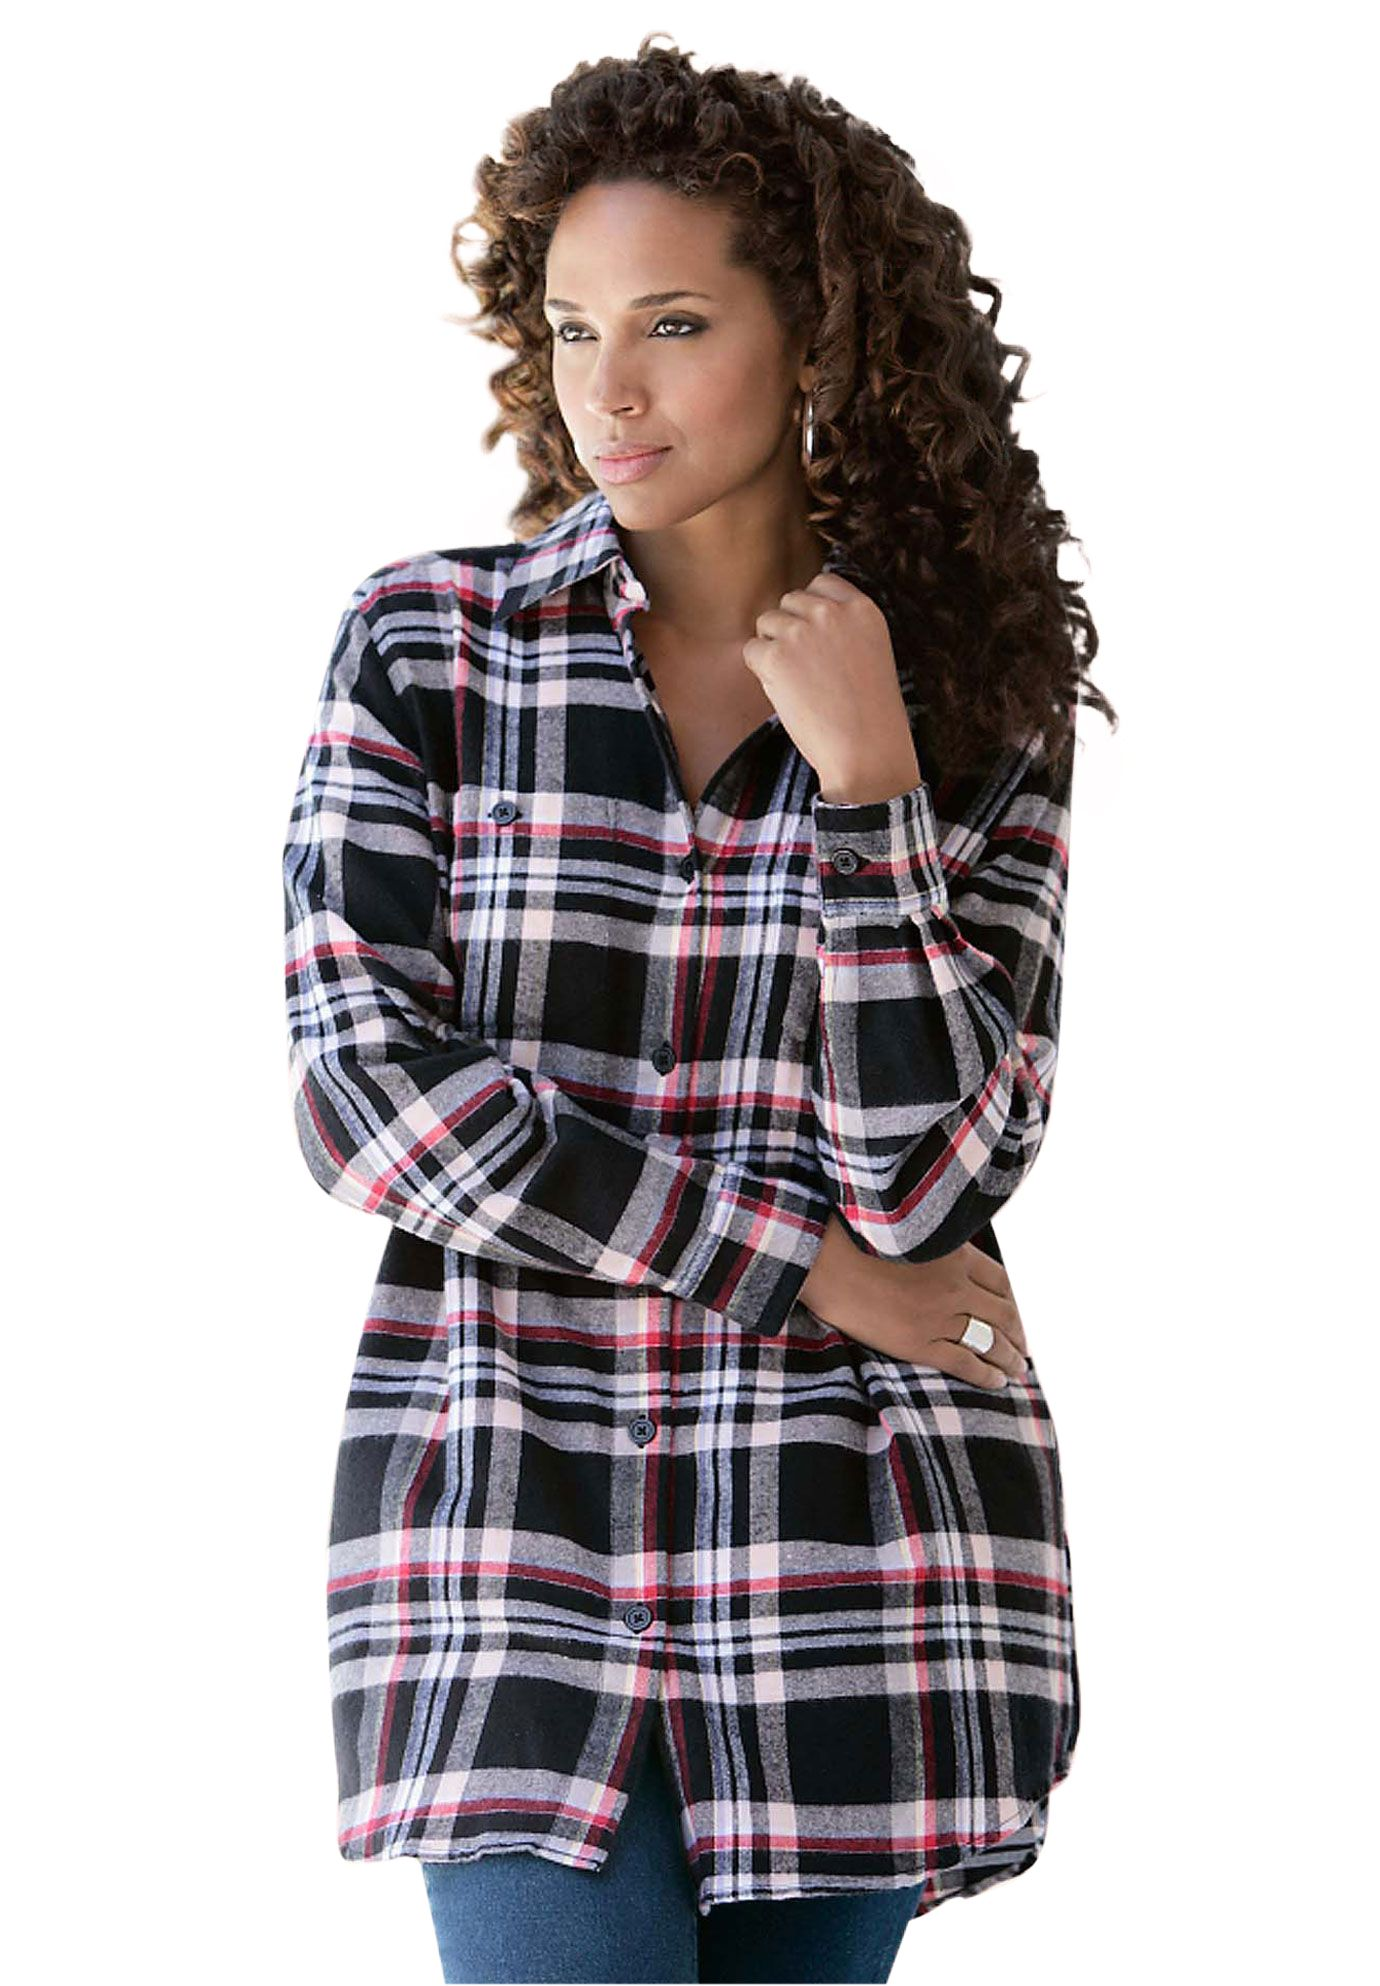 Flannel plaid bigshirt plus size long sleeve onestopplus stuff